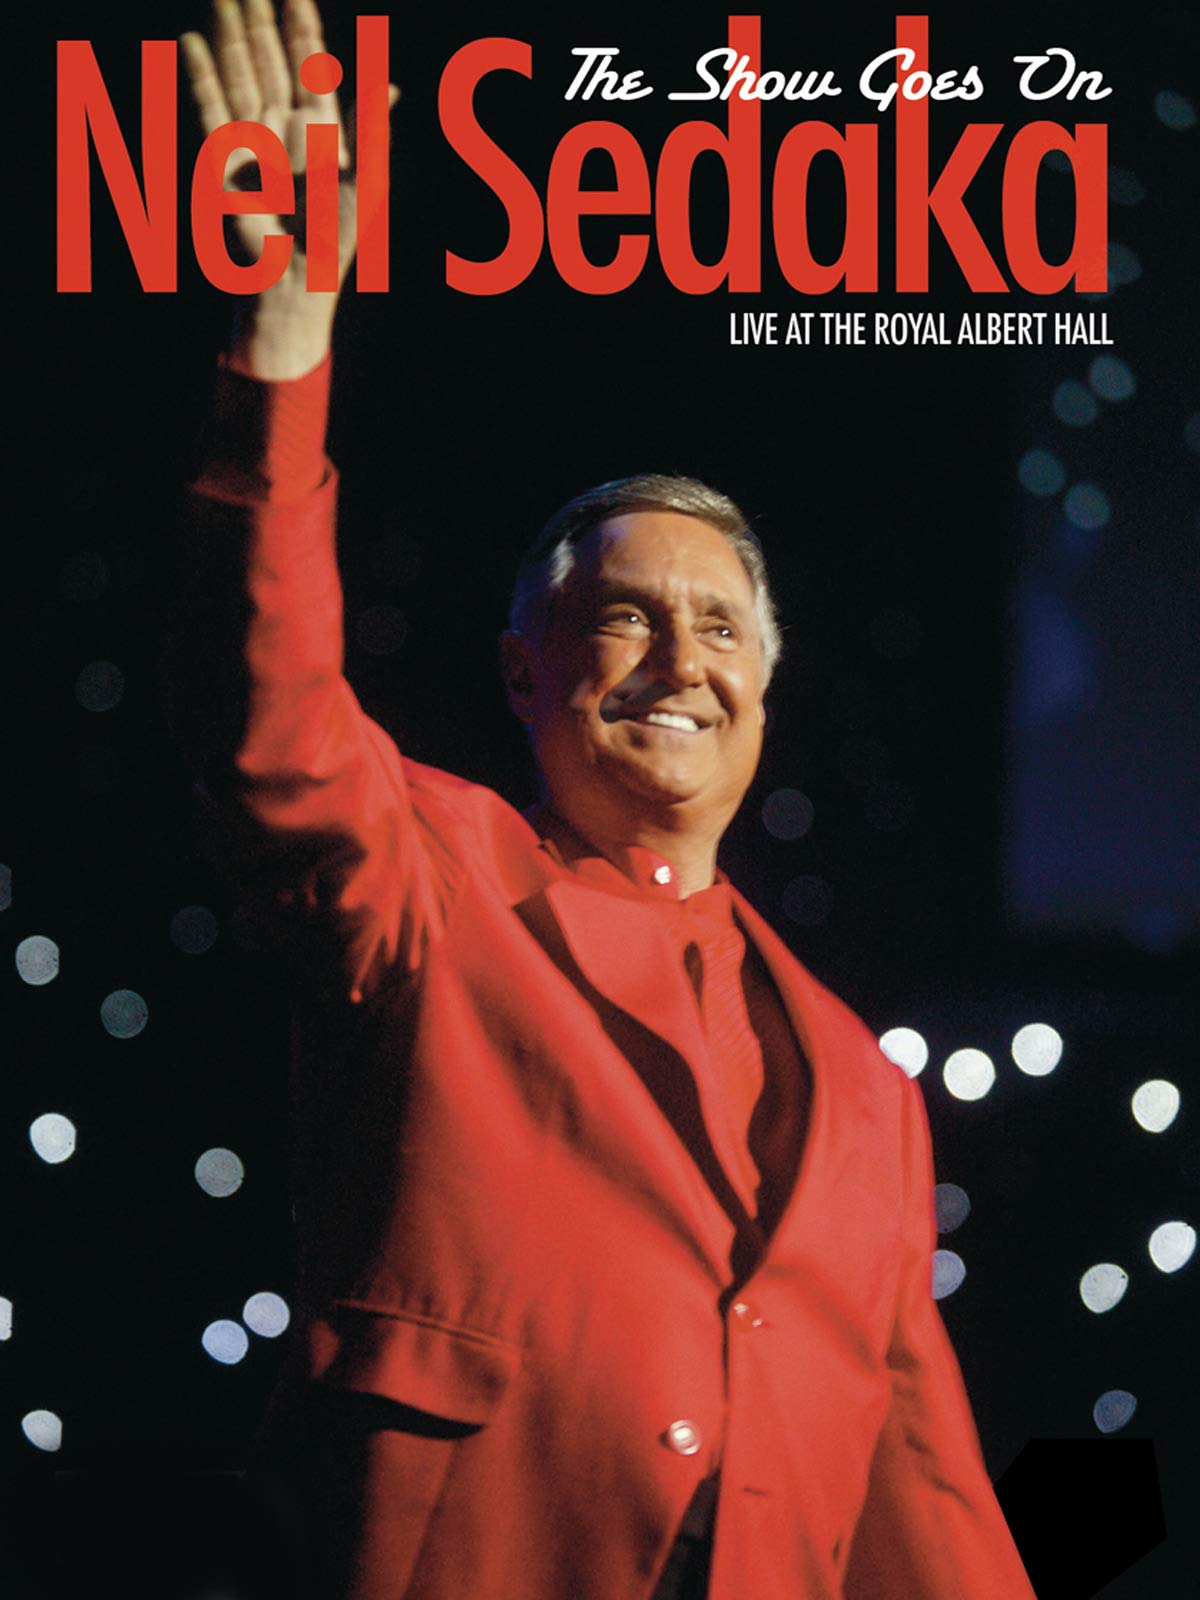 Neil Sedaka - The Show Goes On Live At The Royal Albert Hall on Amazon Prime Video UK